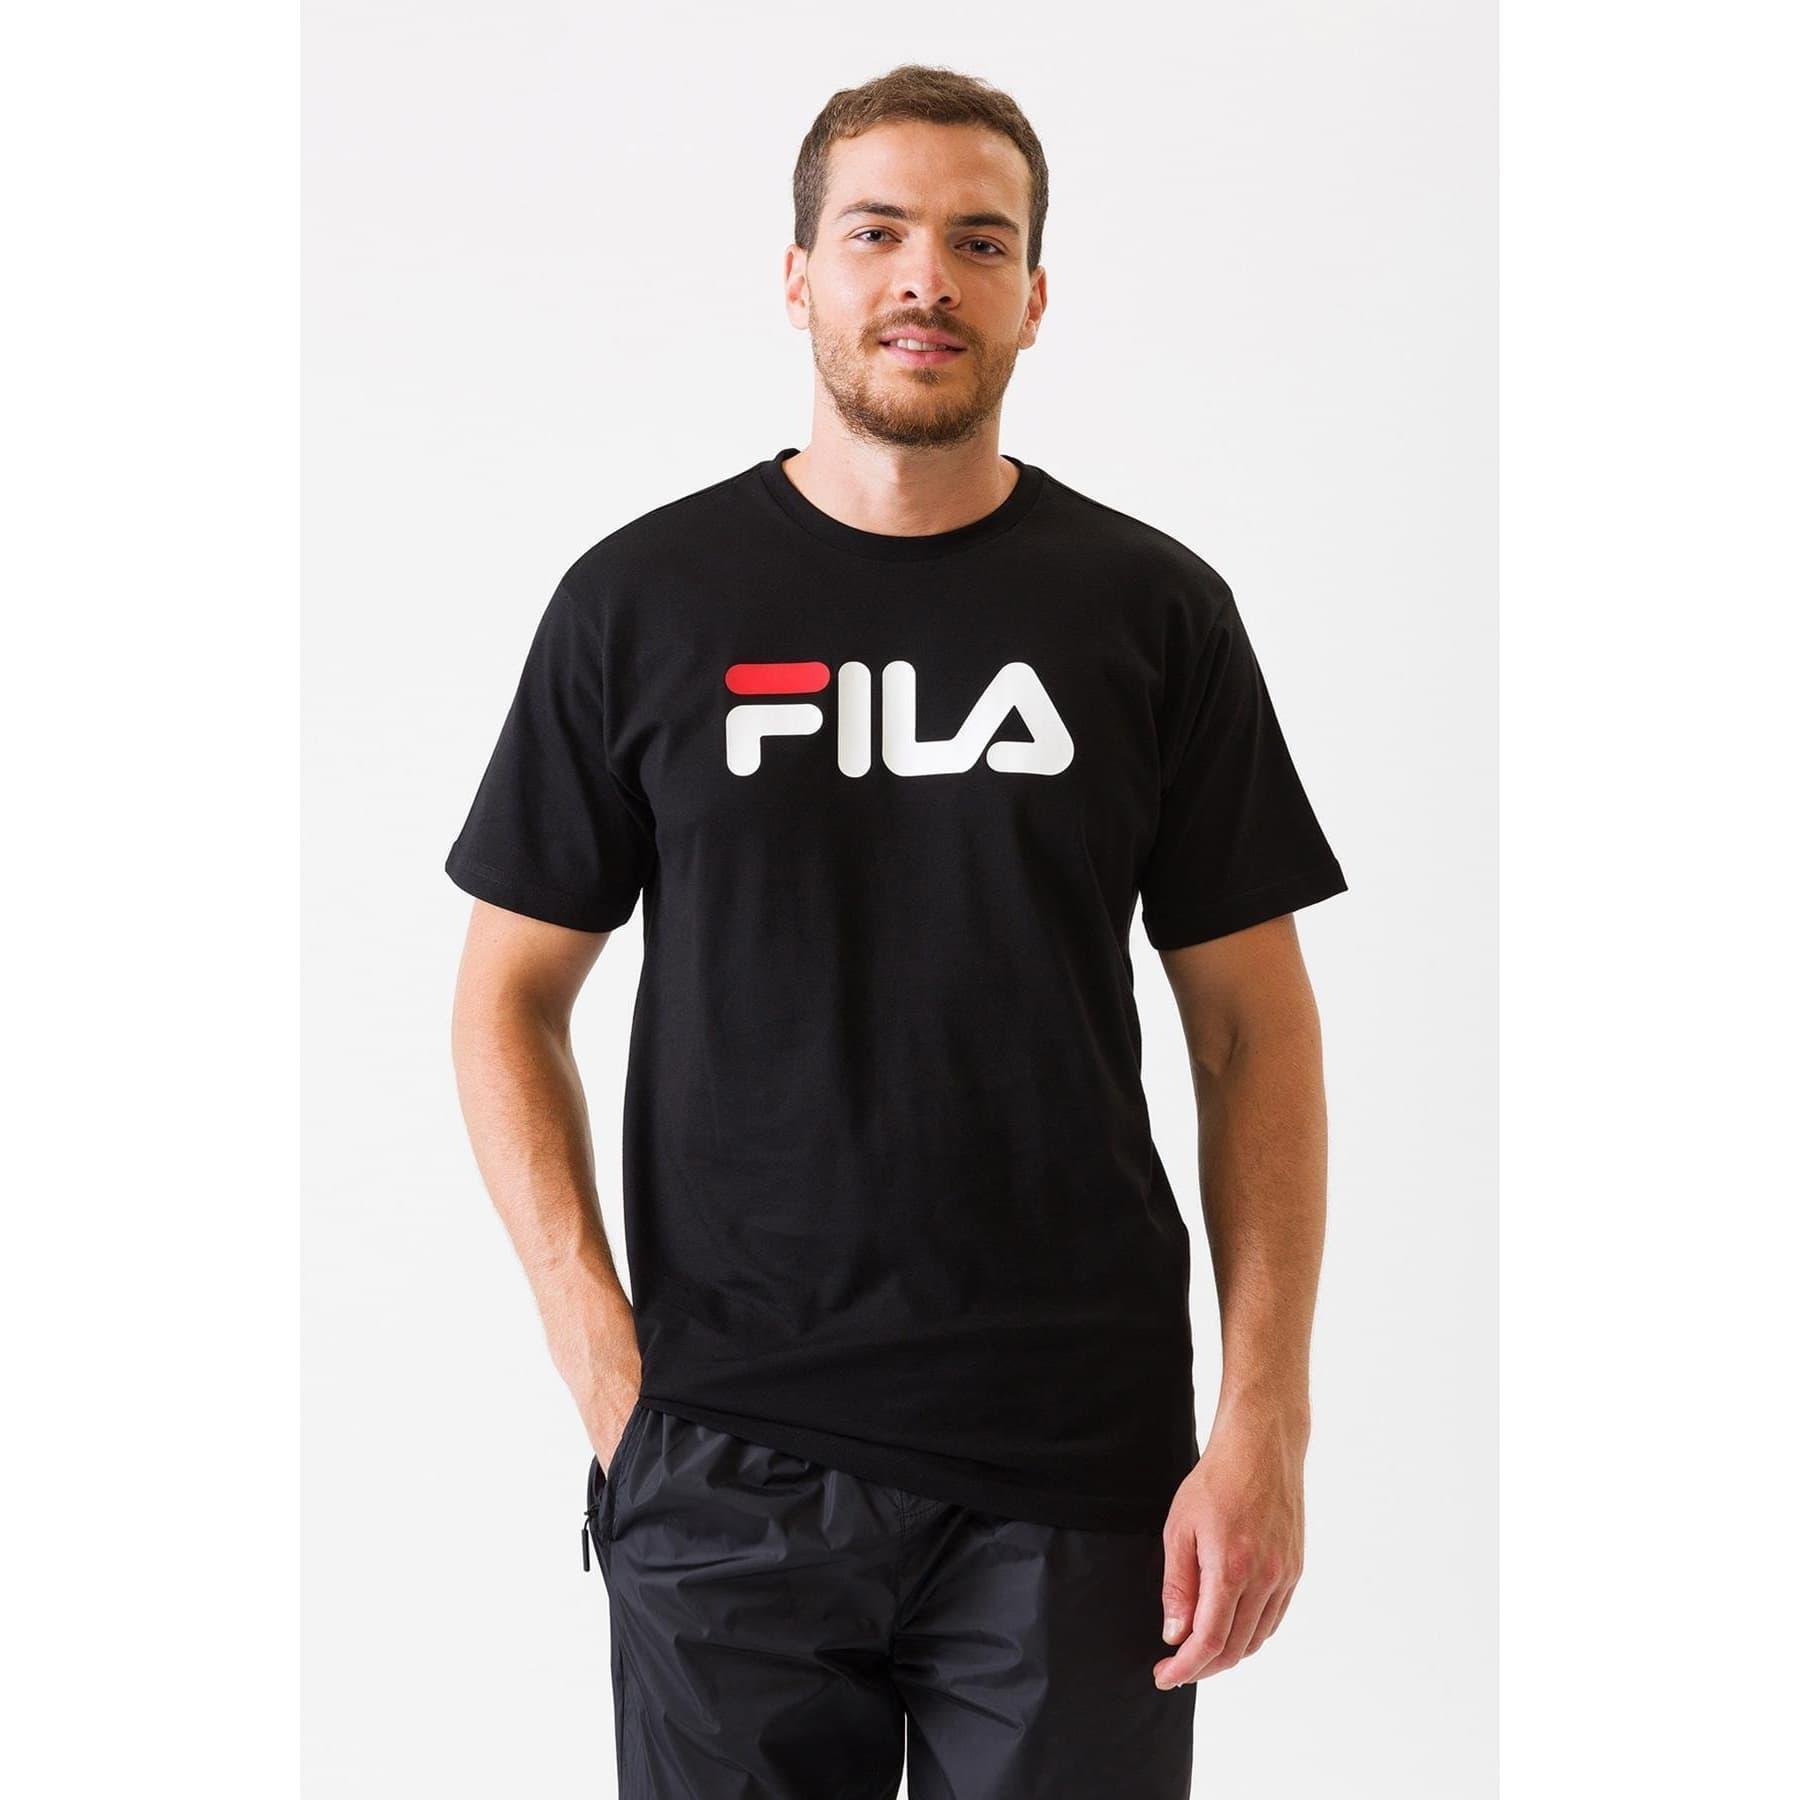 Fila Classic Pure SS Erkek Siyah Tişört (681093_002)